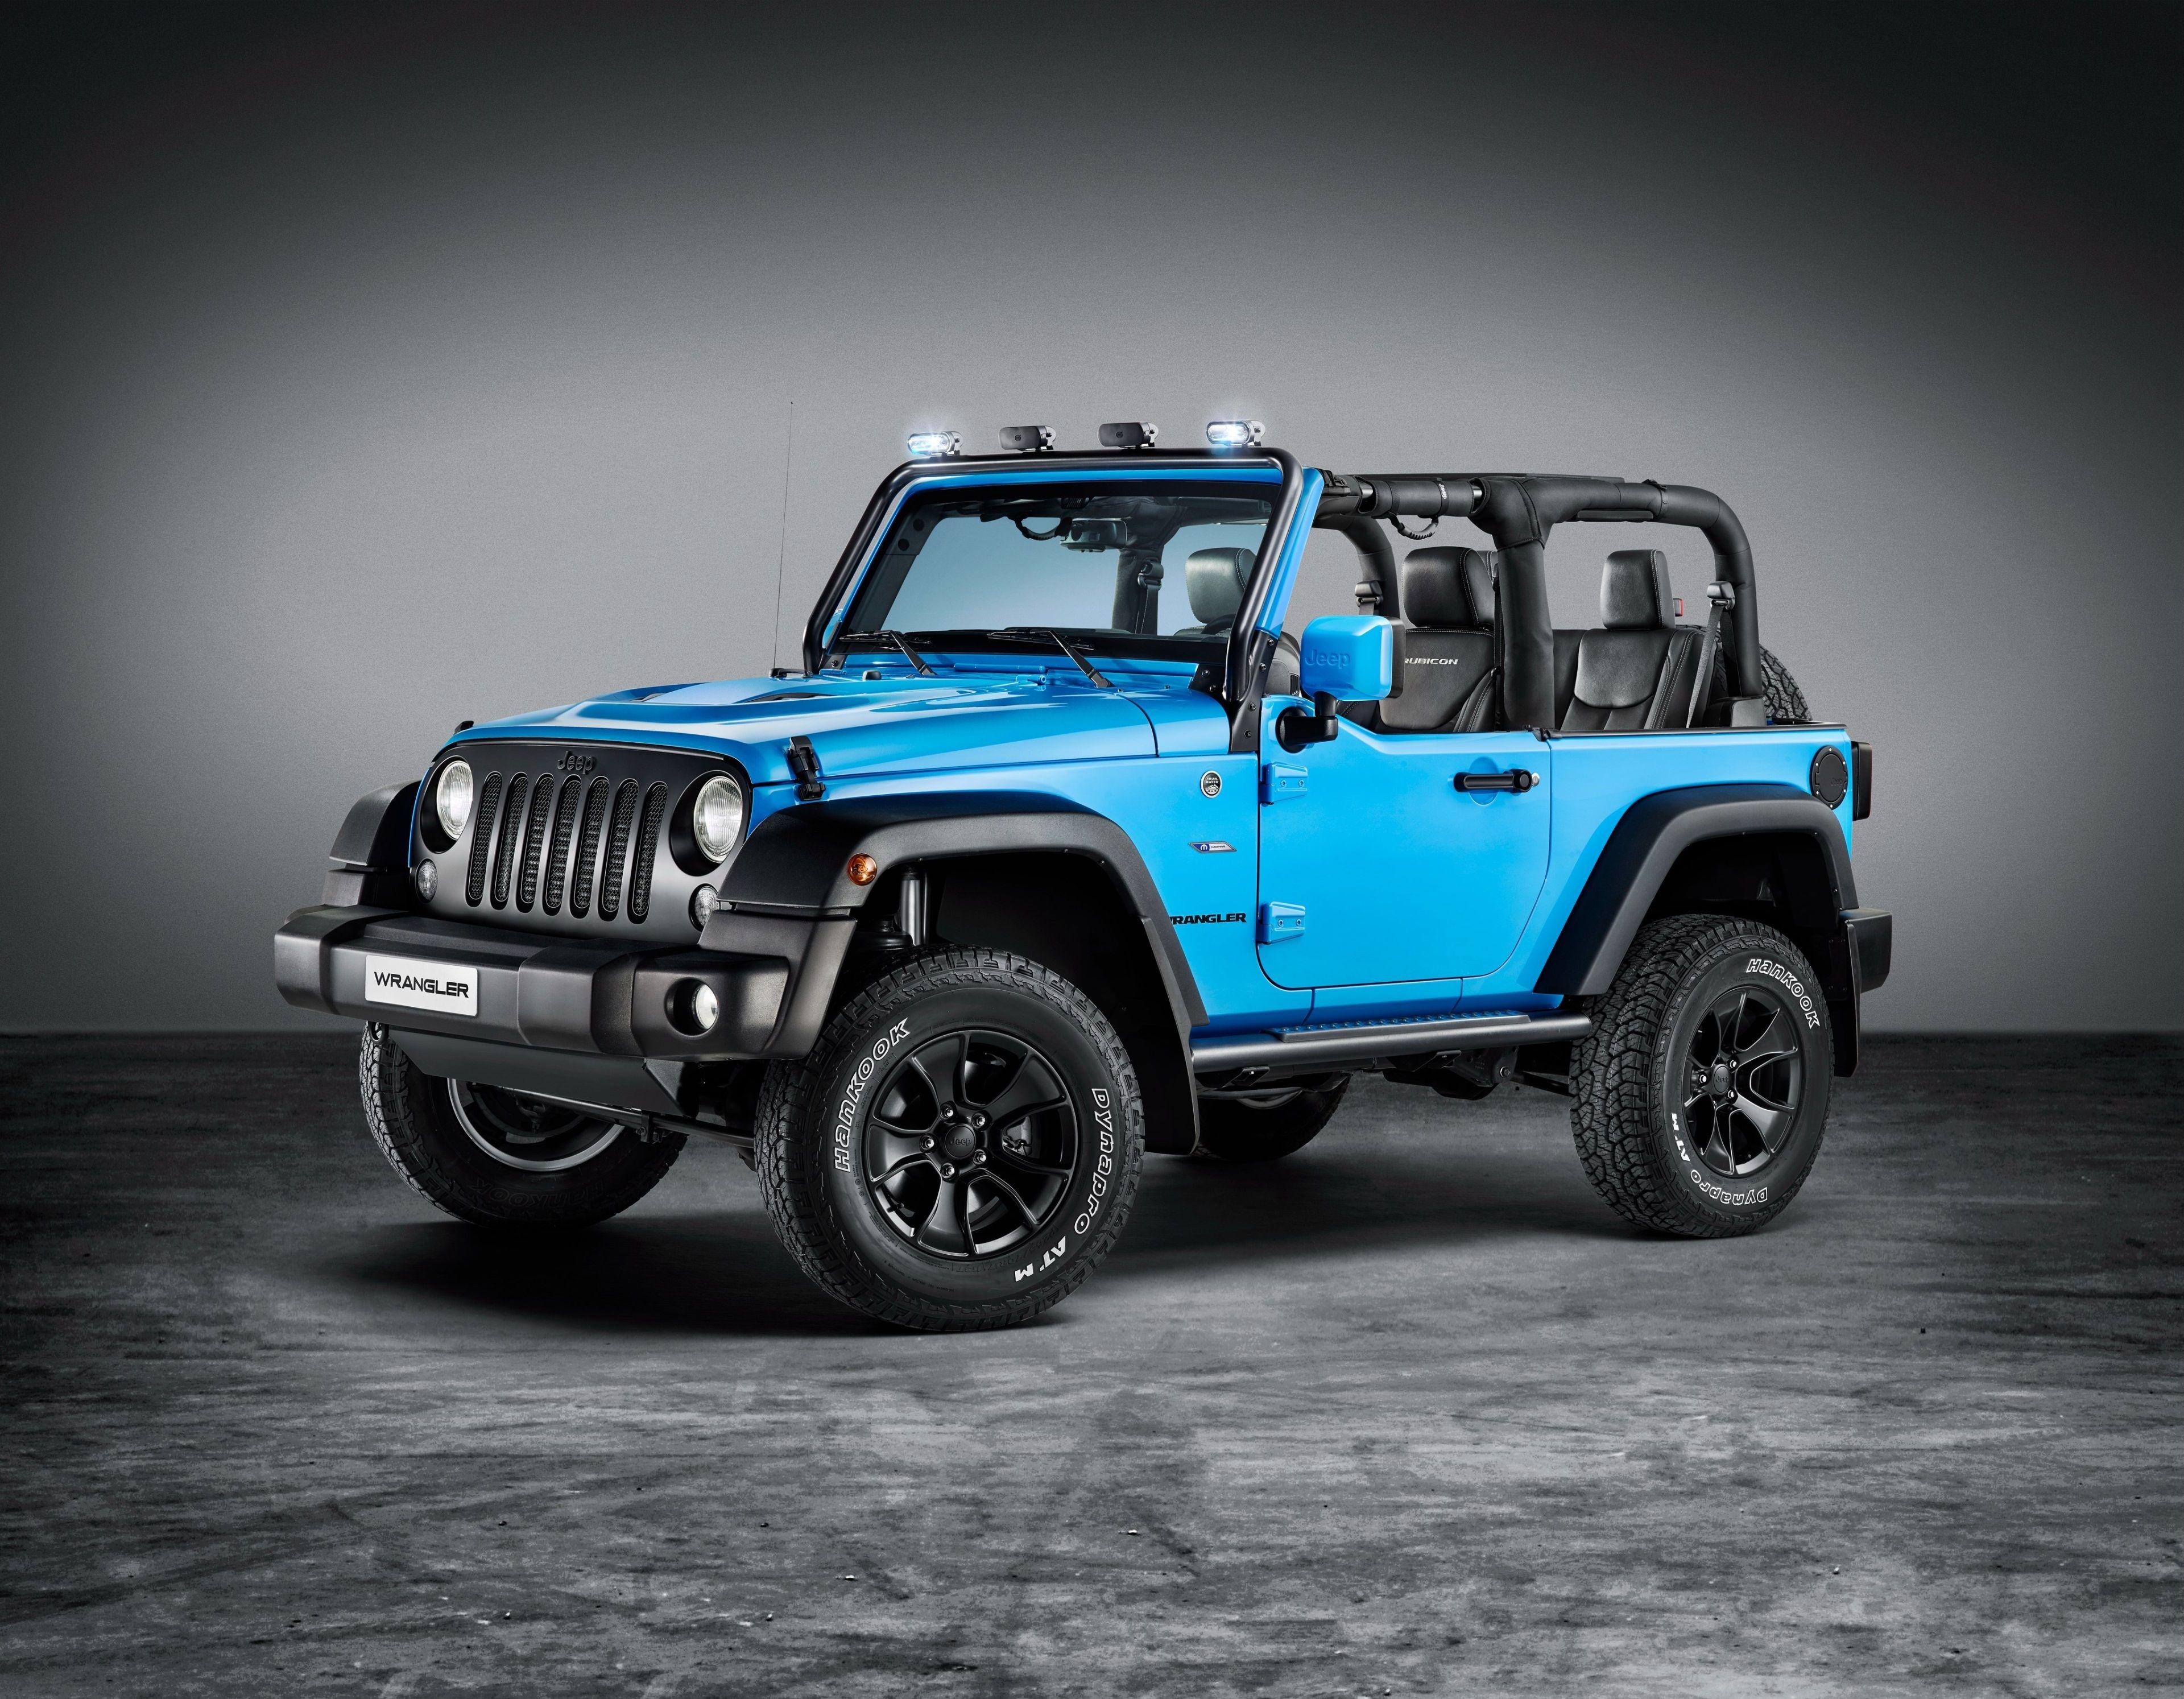 3840x2987 Jeep Wrangler Rubicon Moparone Pack 4k Amazing Hd